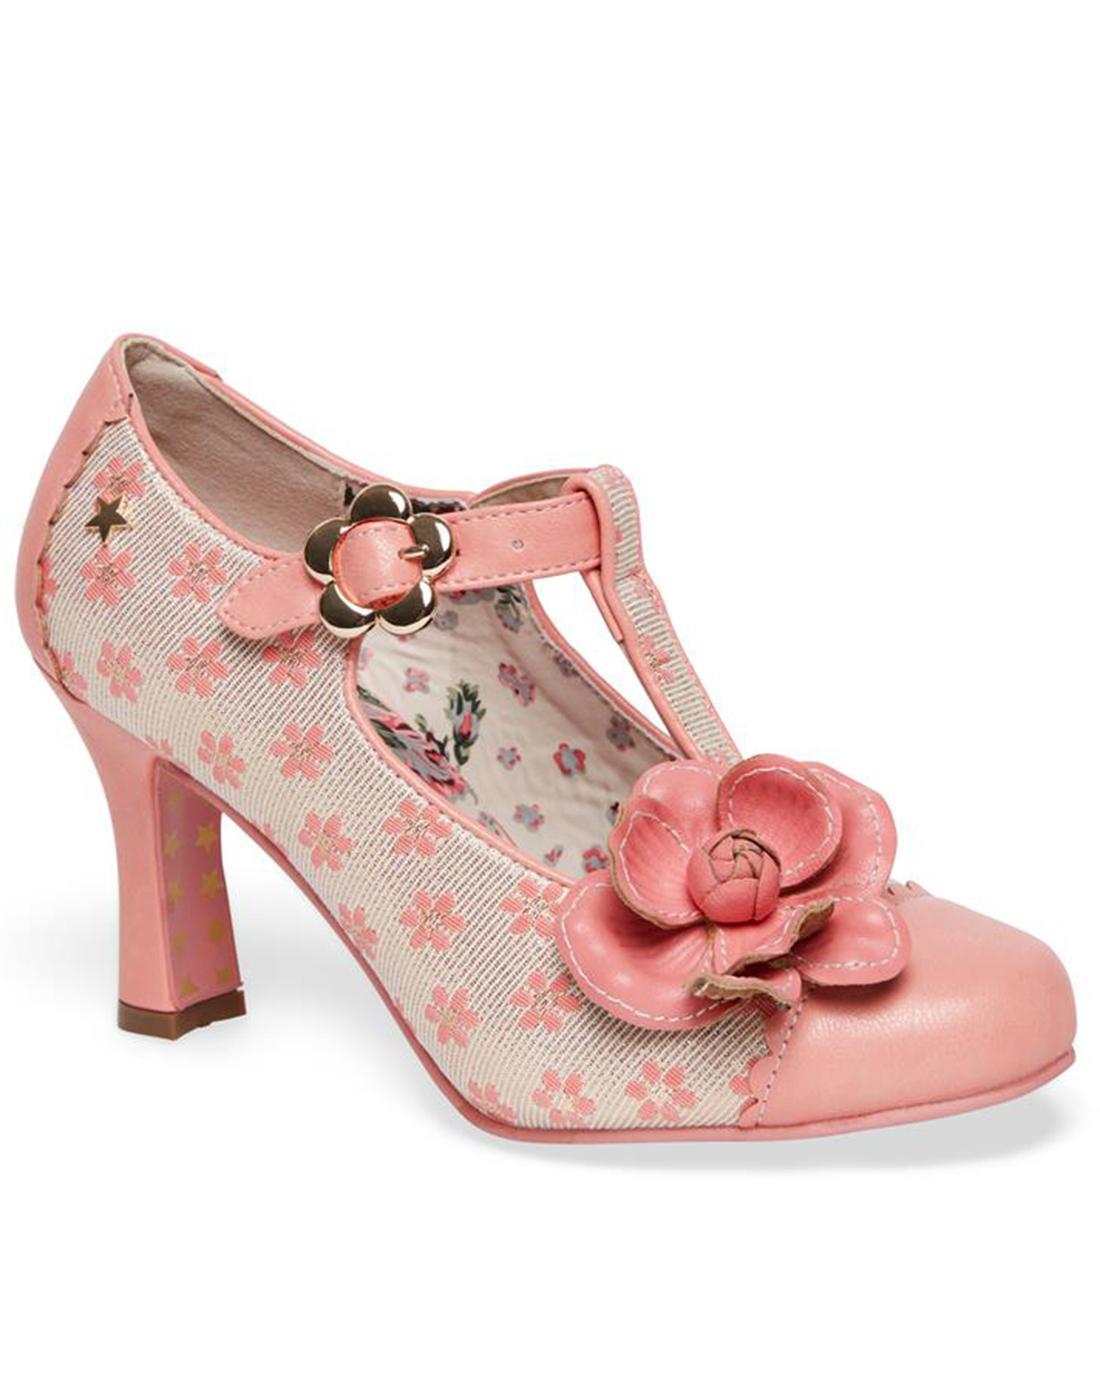 Cecelia JOE BROWNS Retro Floral T-Bar Heels Pink